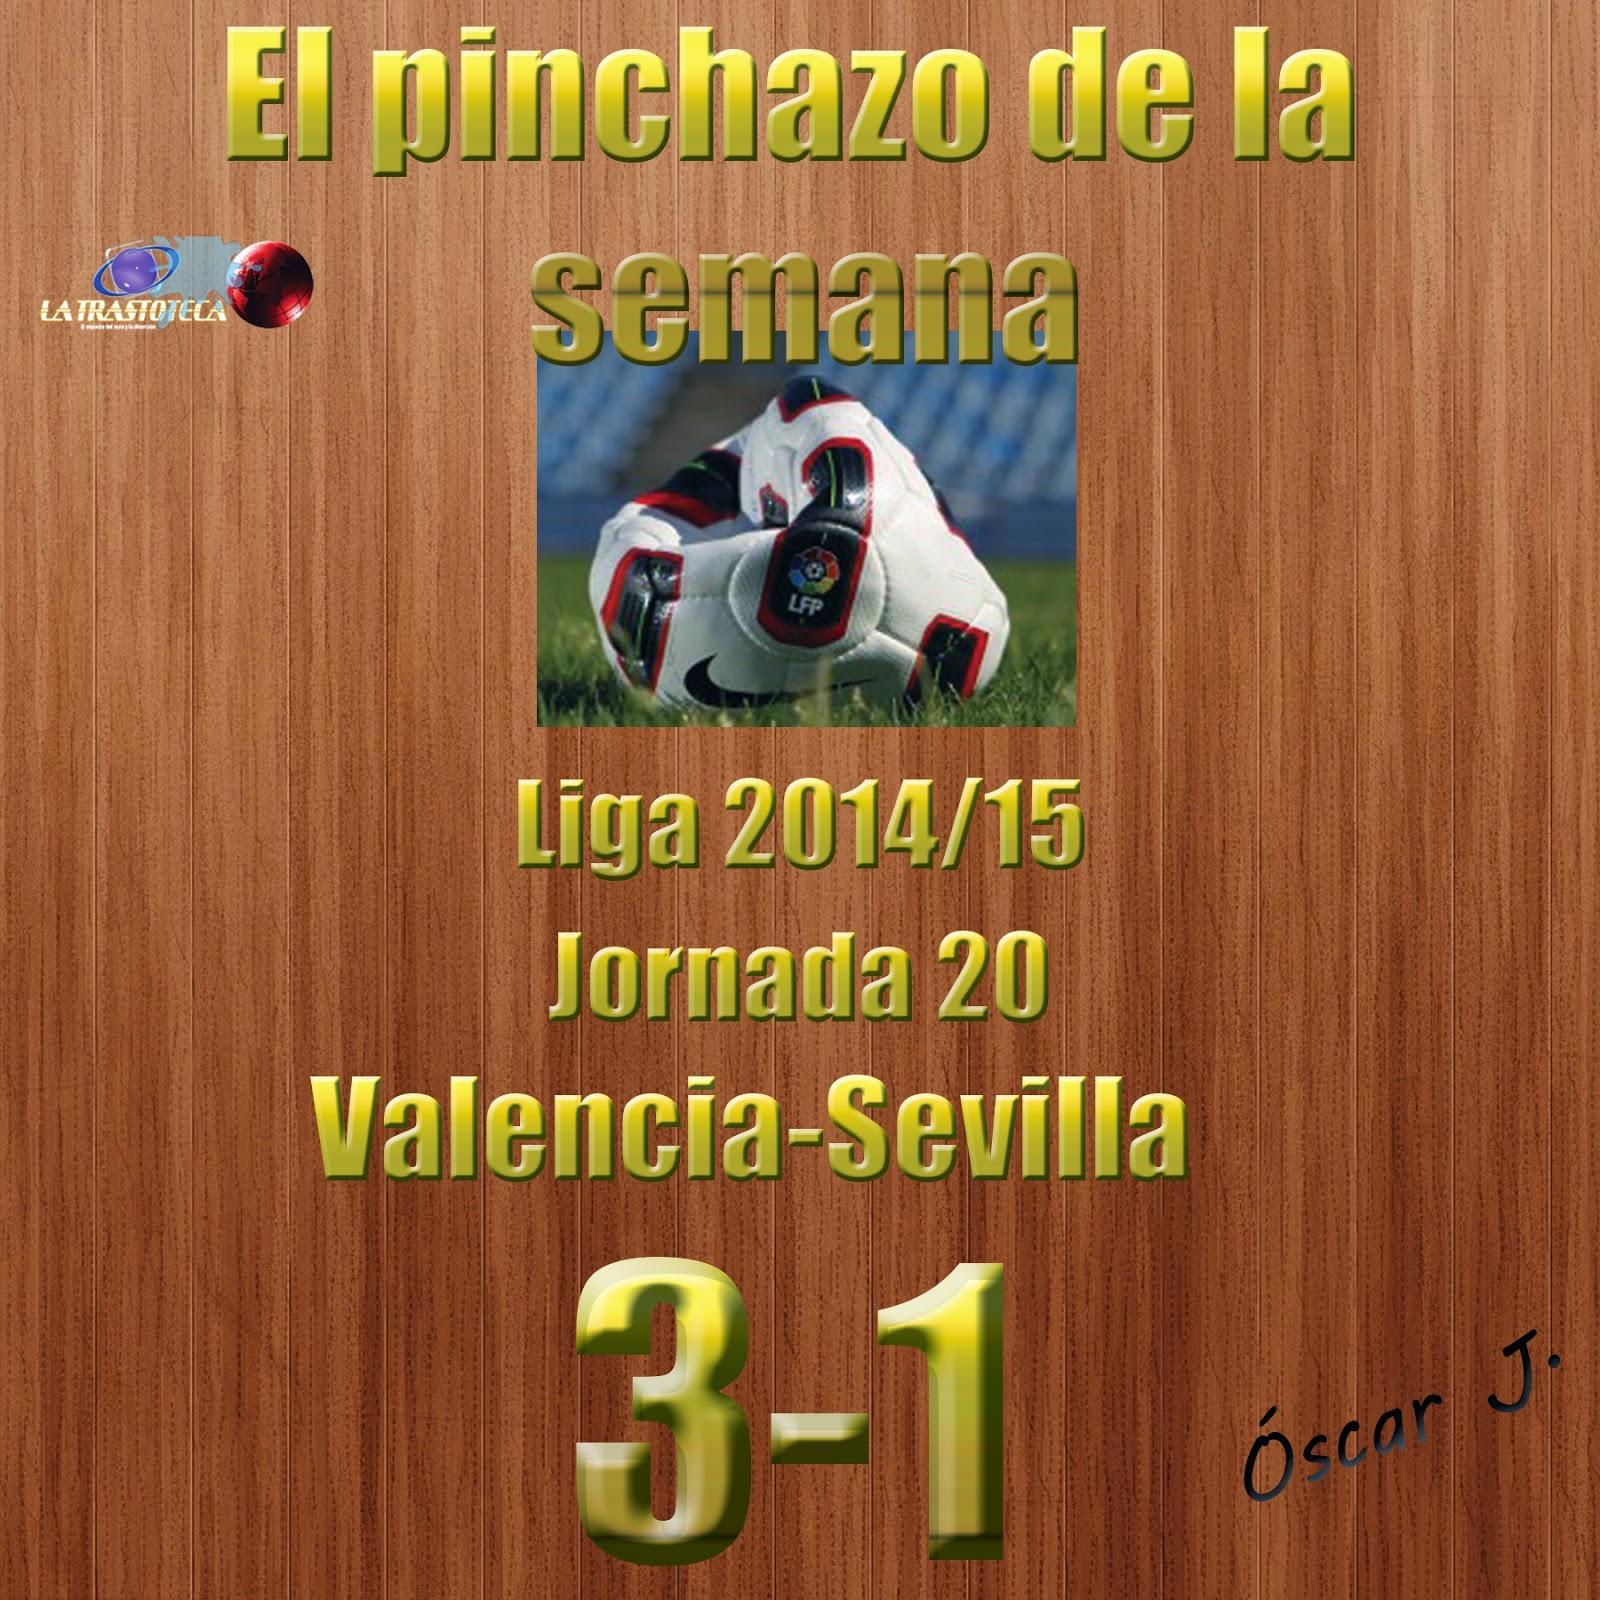 Valencia 3-1 Sevilla. Liga 2014/15 - Jornada 20. El pinchazo de la semana.